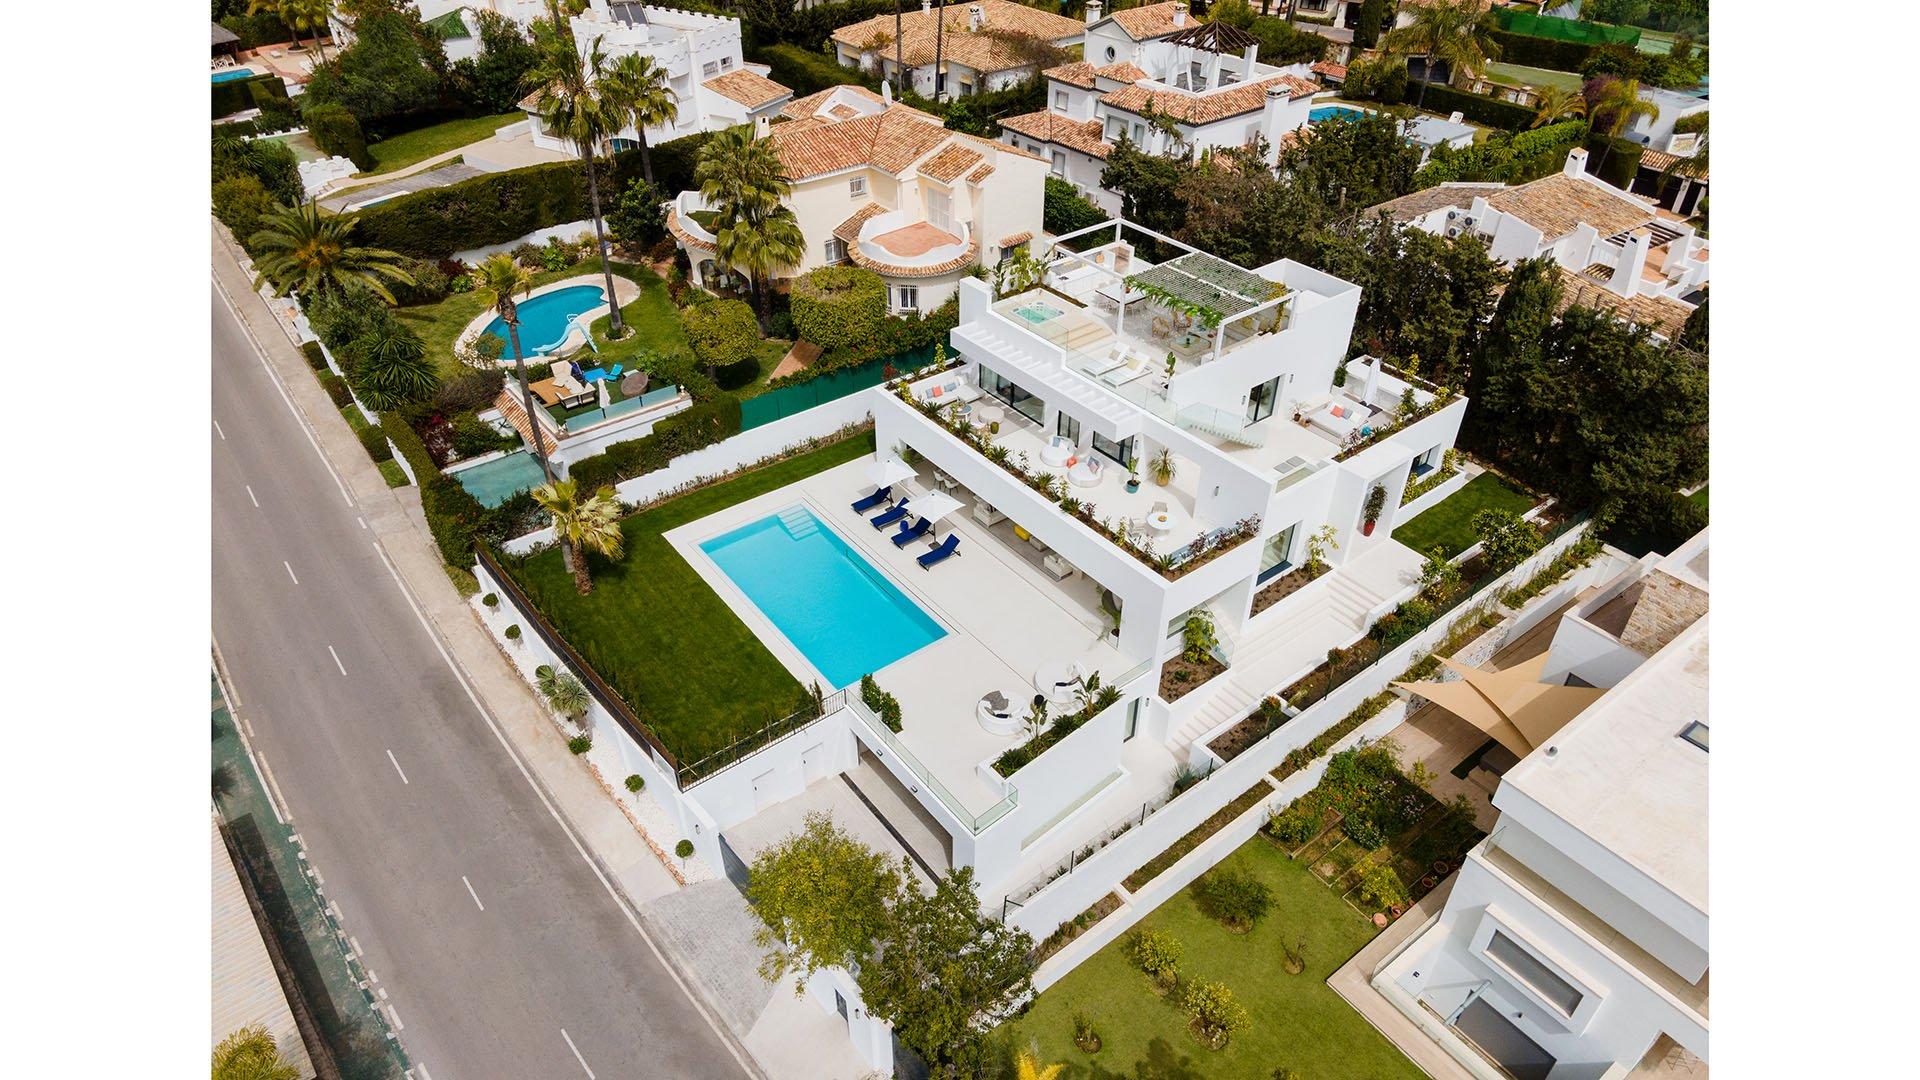 Aloha 151: Impressive villa in the heart of the golf valley in Marbella